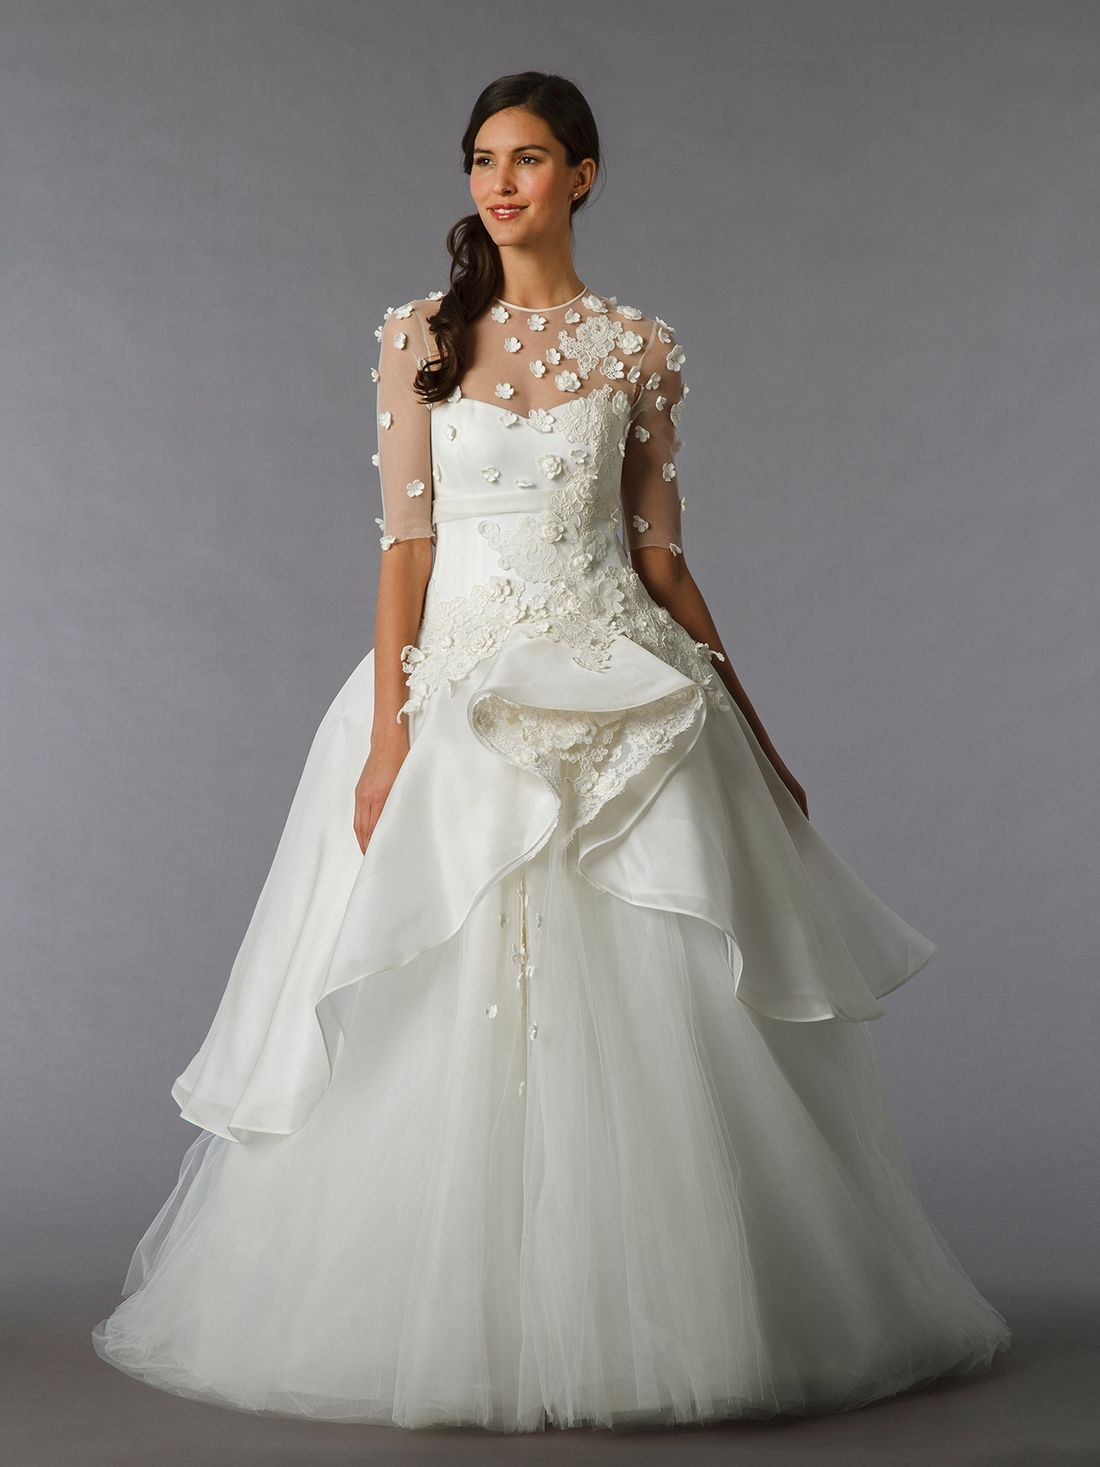 KleinfeldBridal.com: Edgardo Bonilla: Bridal Gown: 32781528 ...